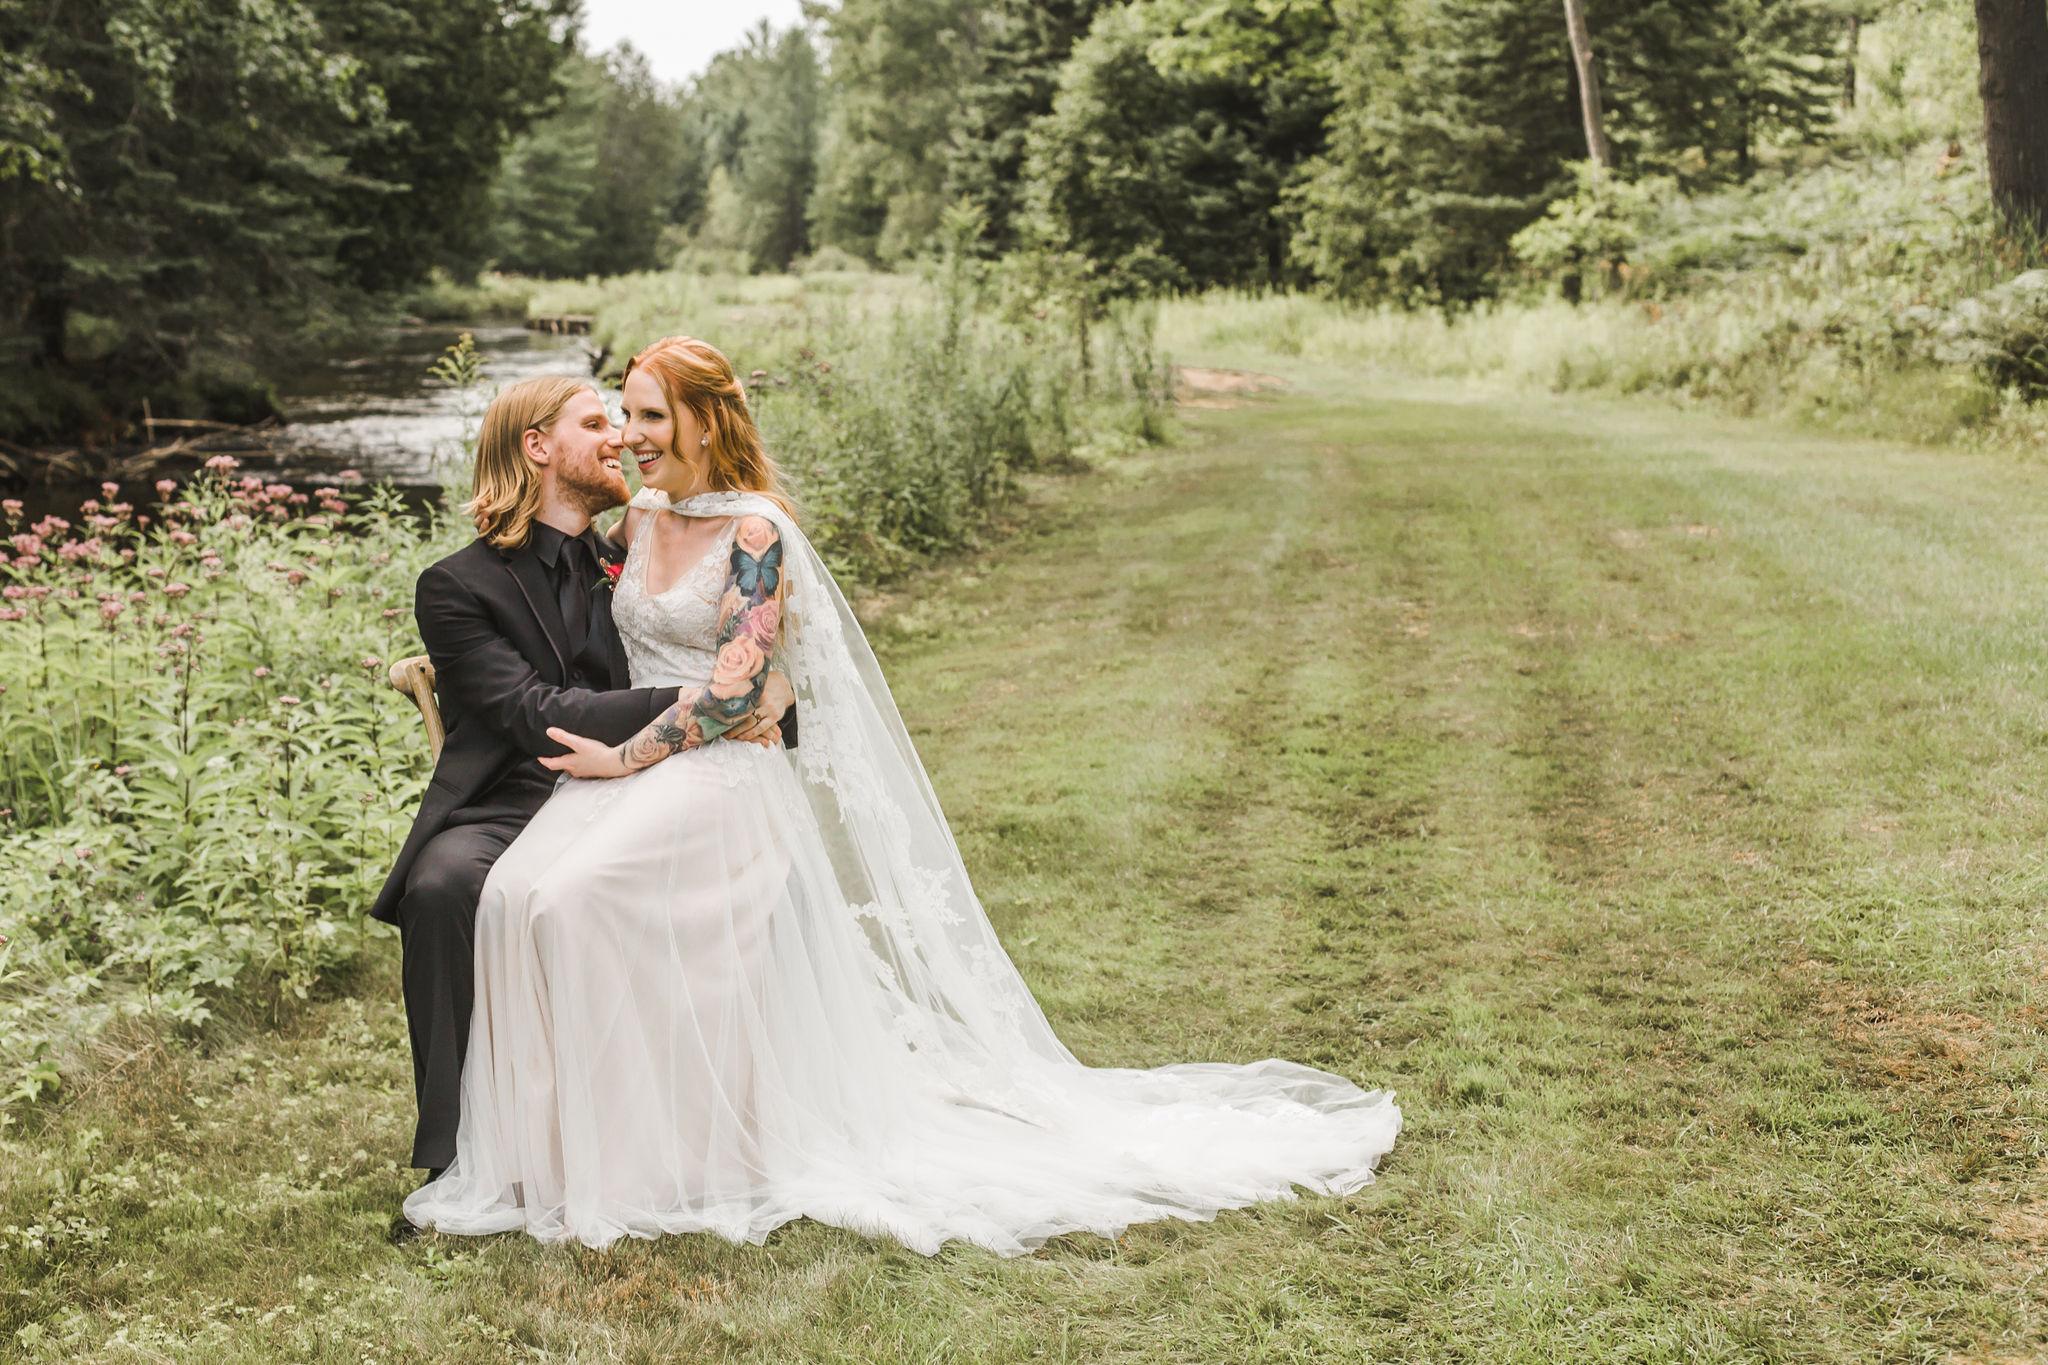 Lace wedding cape dress